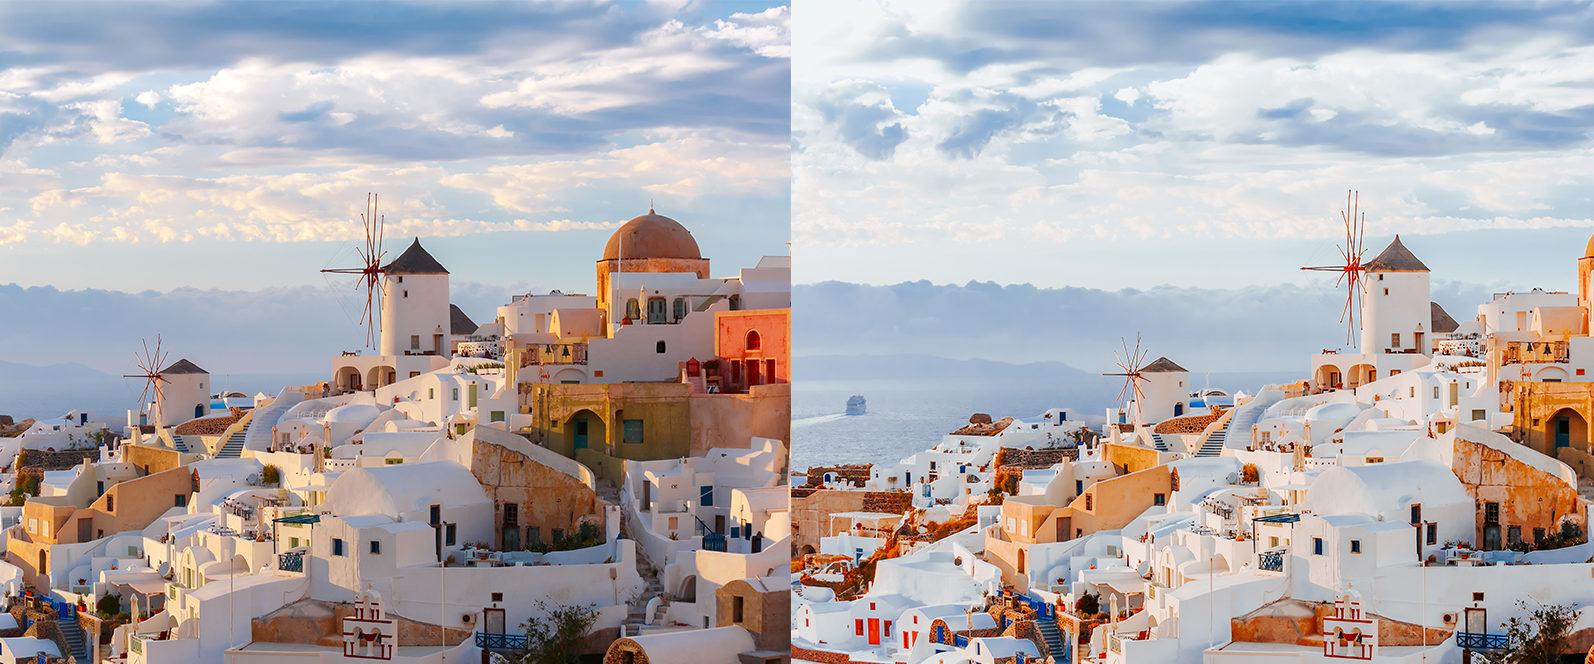 14 x Greece Lightroom Presets   Mobile and Desktop - 1 Greece 1 -